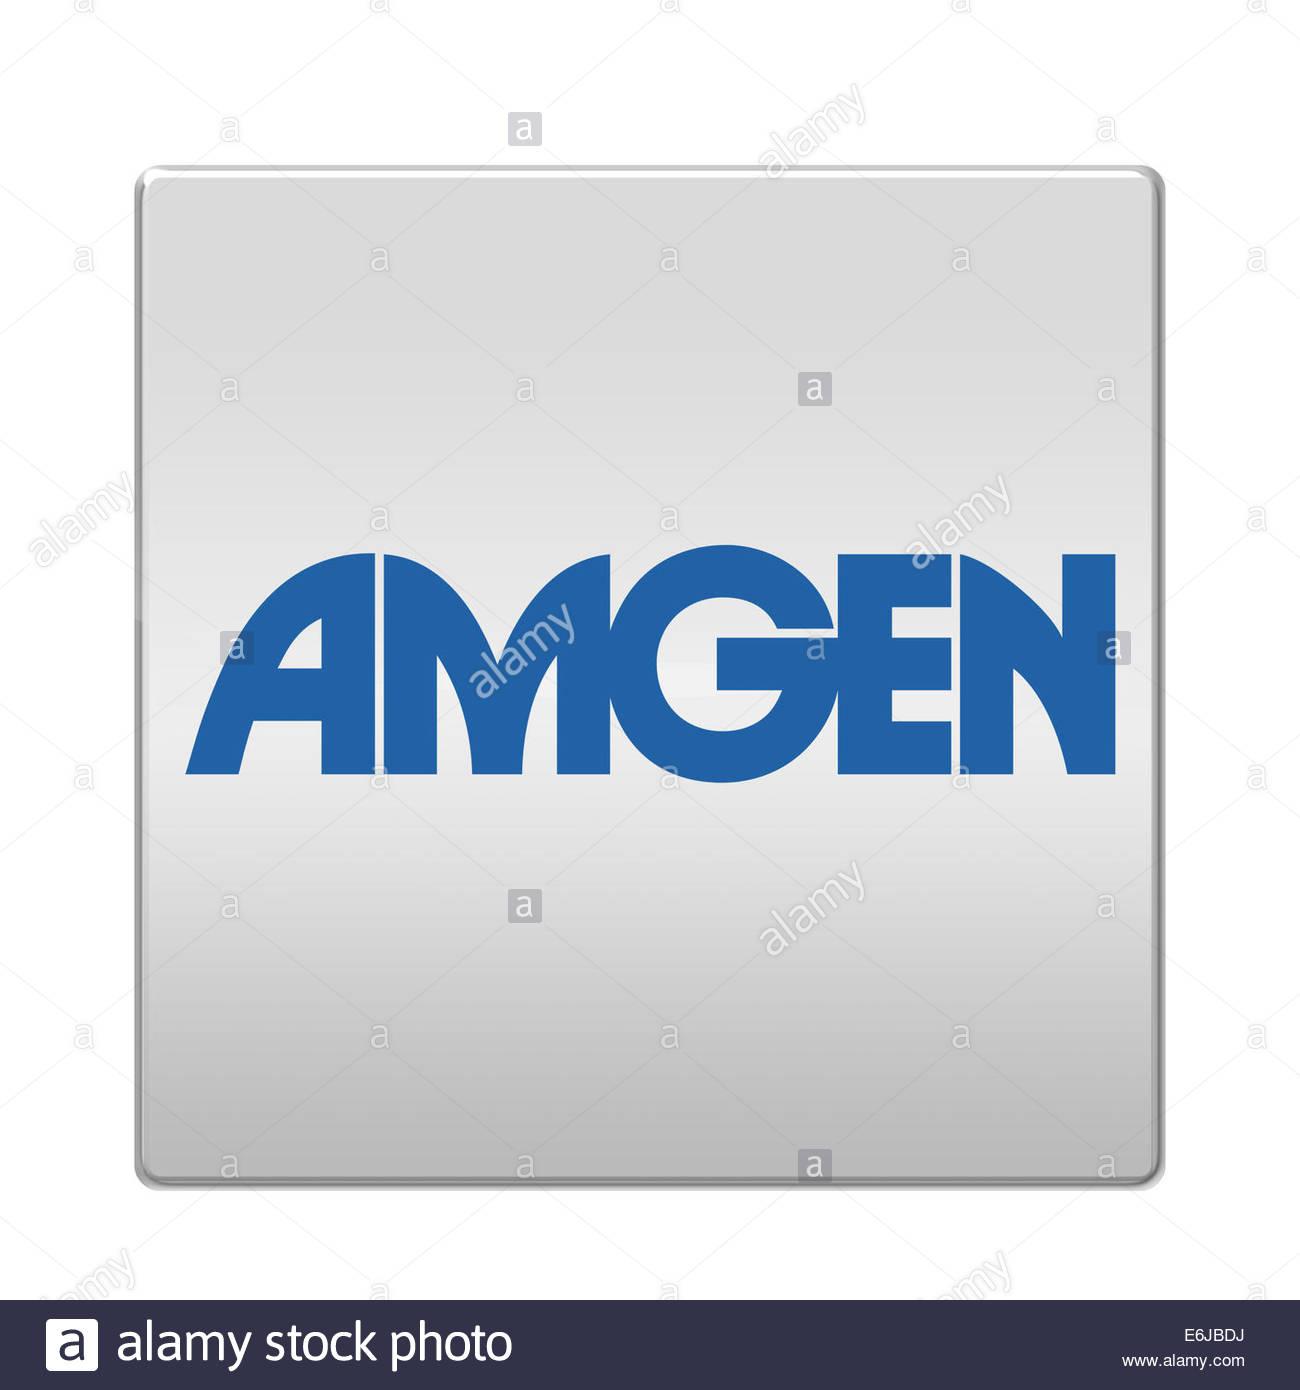 Amgen logo icon isolated app button Stock Photo: 72933550